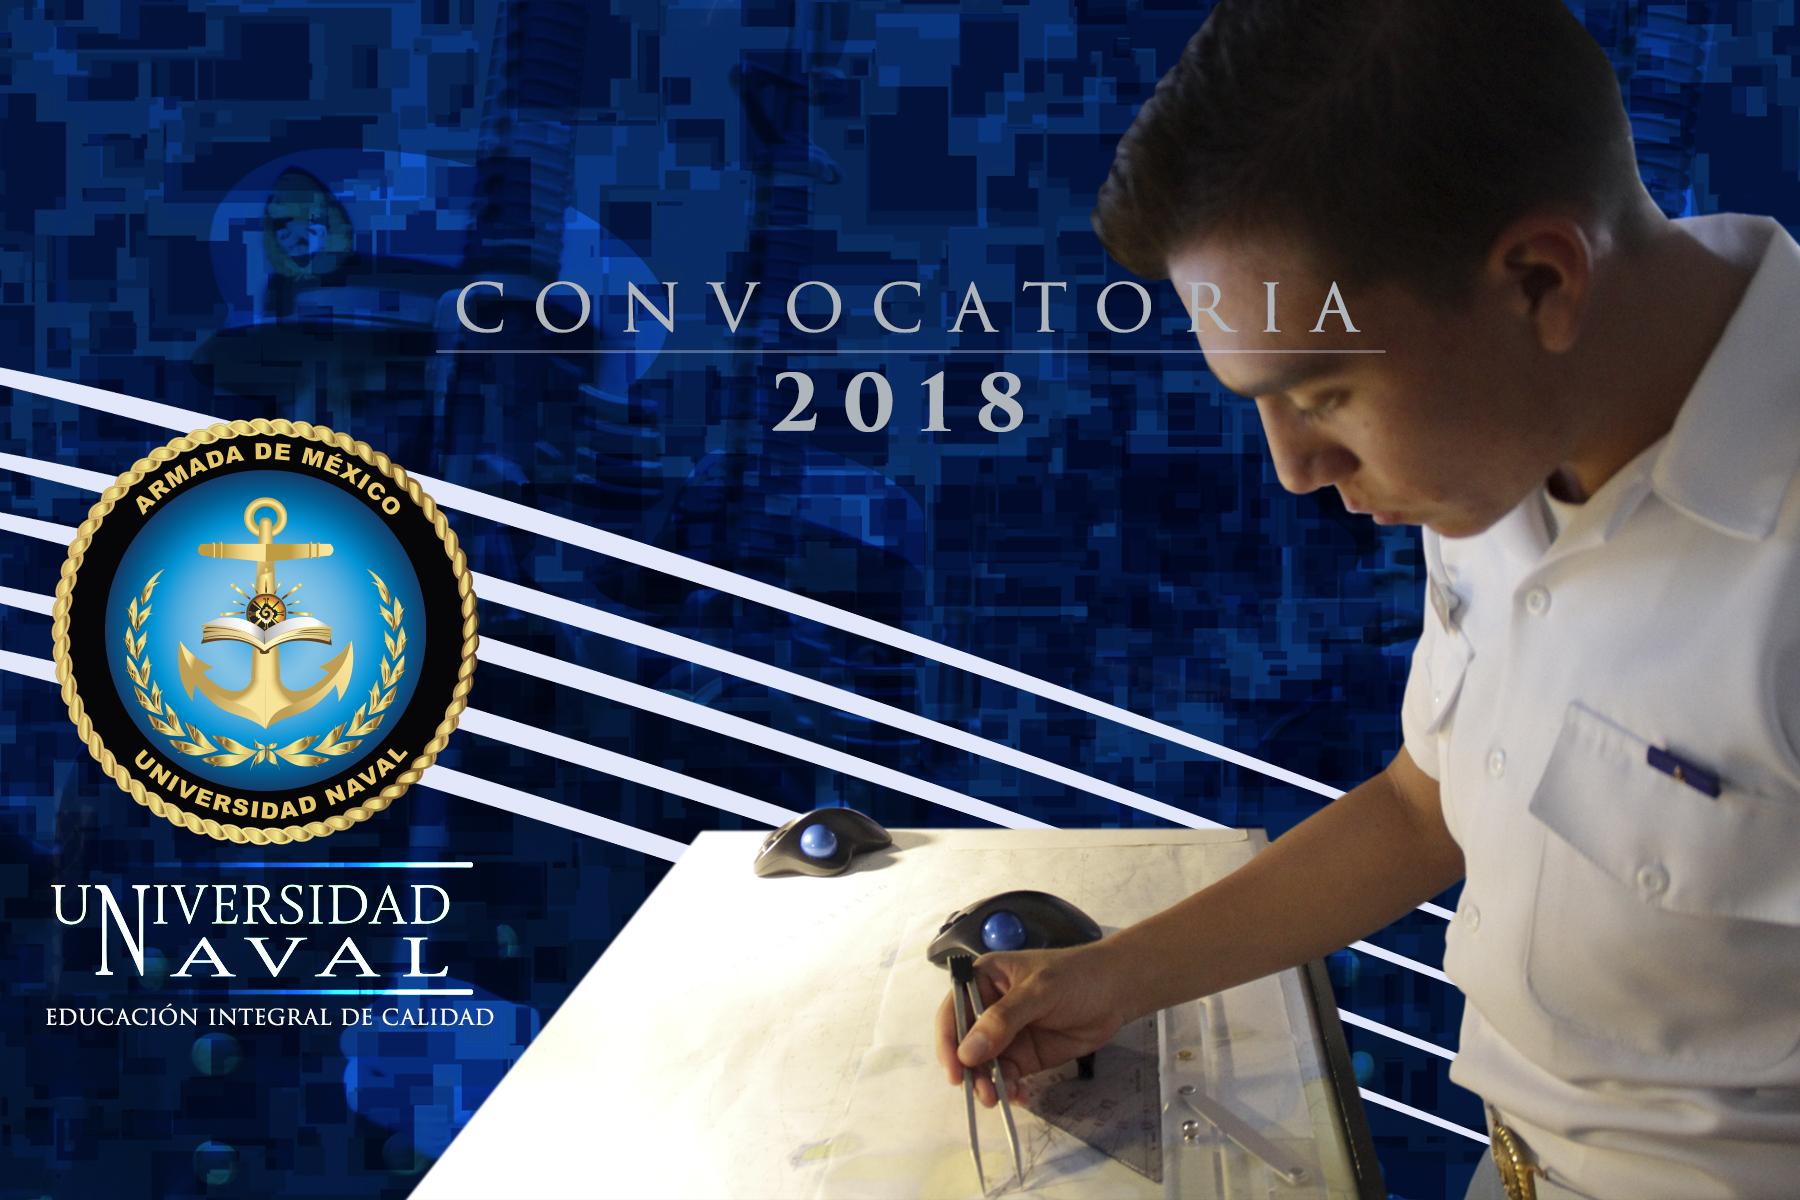 convocatoria2018